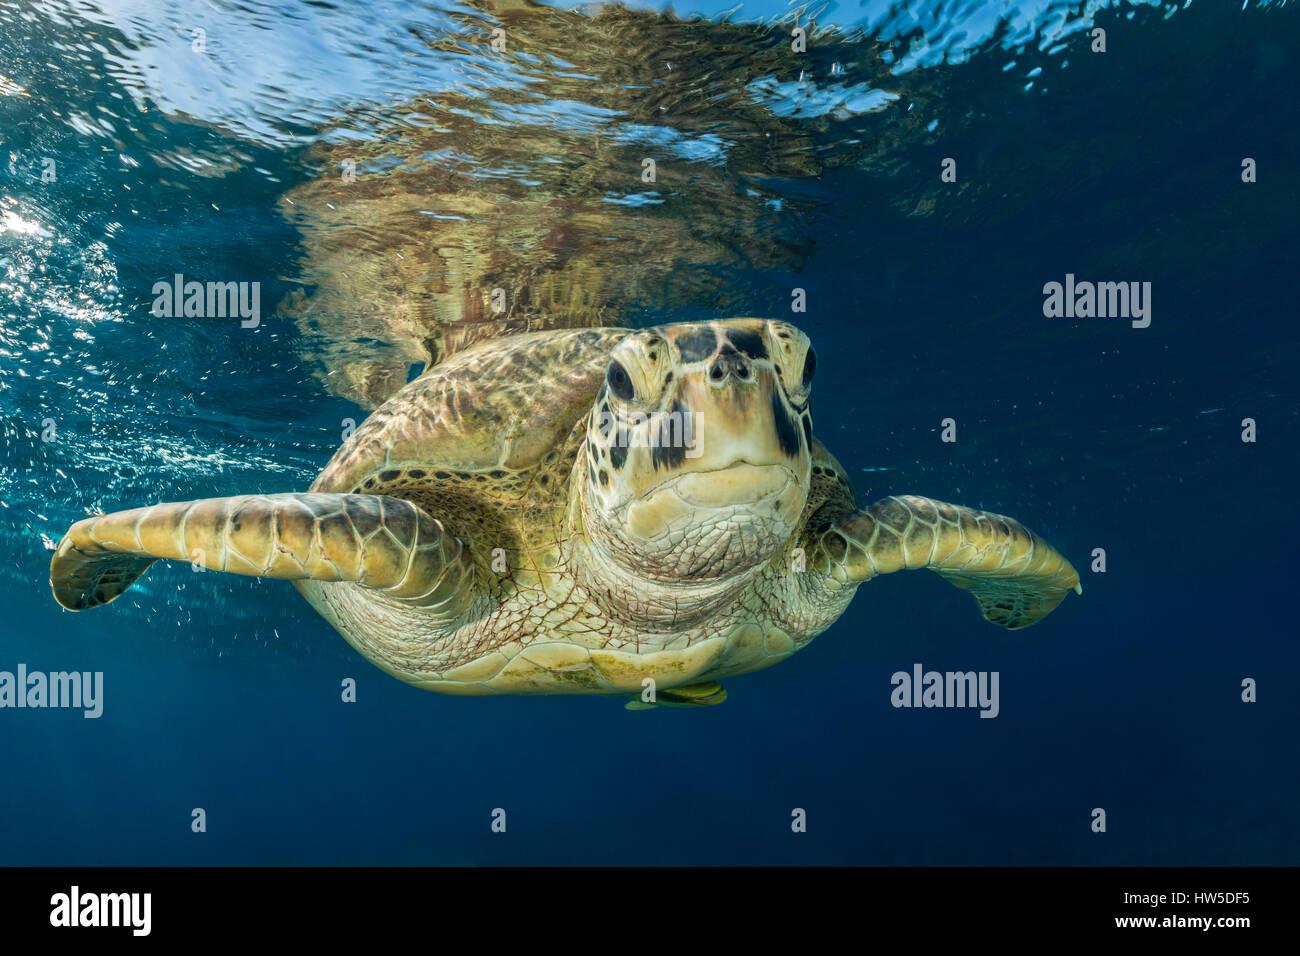 Green Sea Turtle, Chelonia mydas, Marsa Alam, Red Sea, Egypt - Stock Image